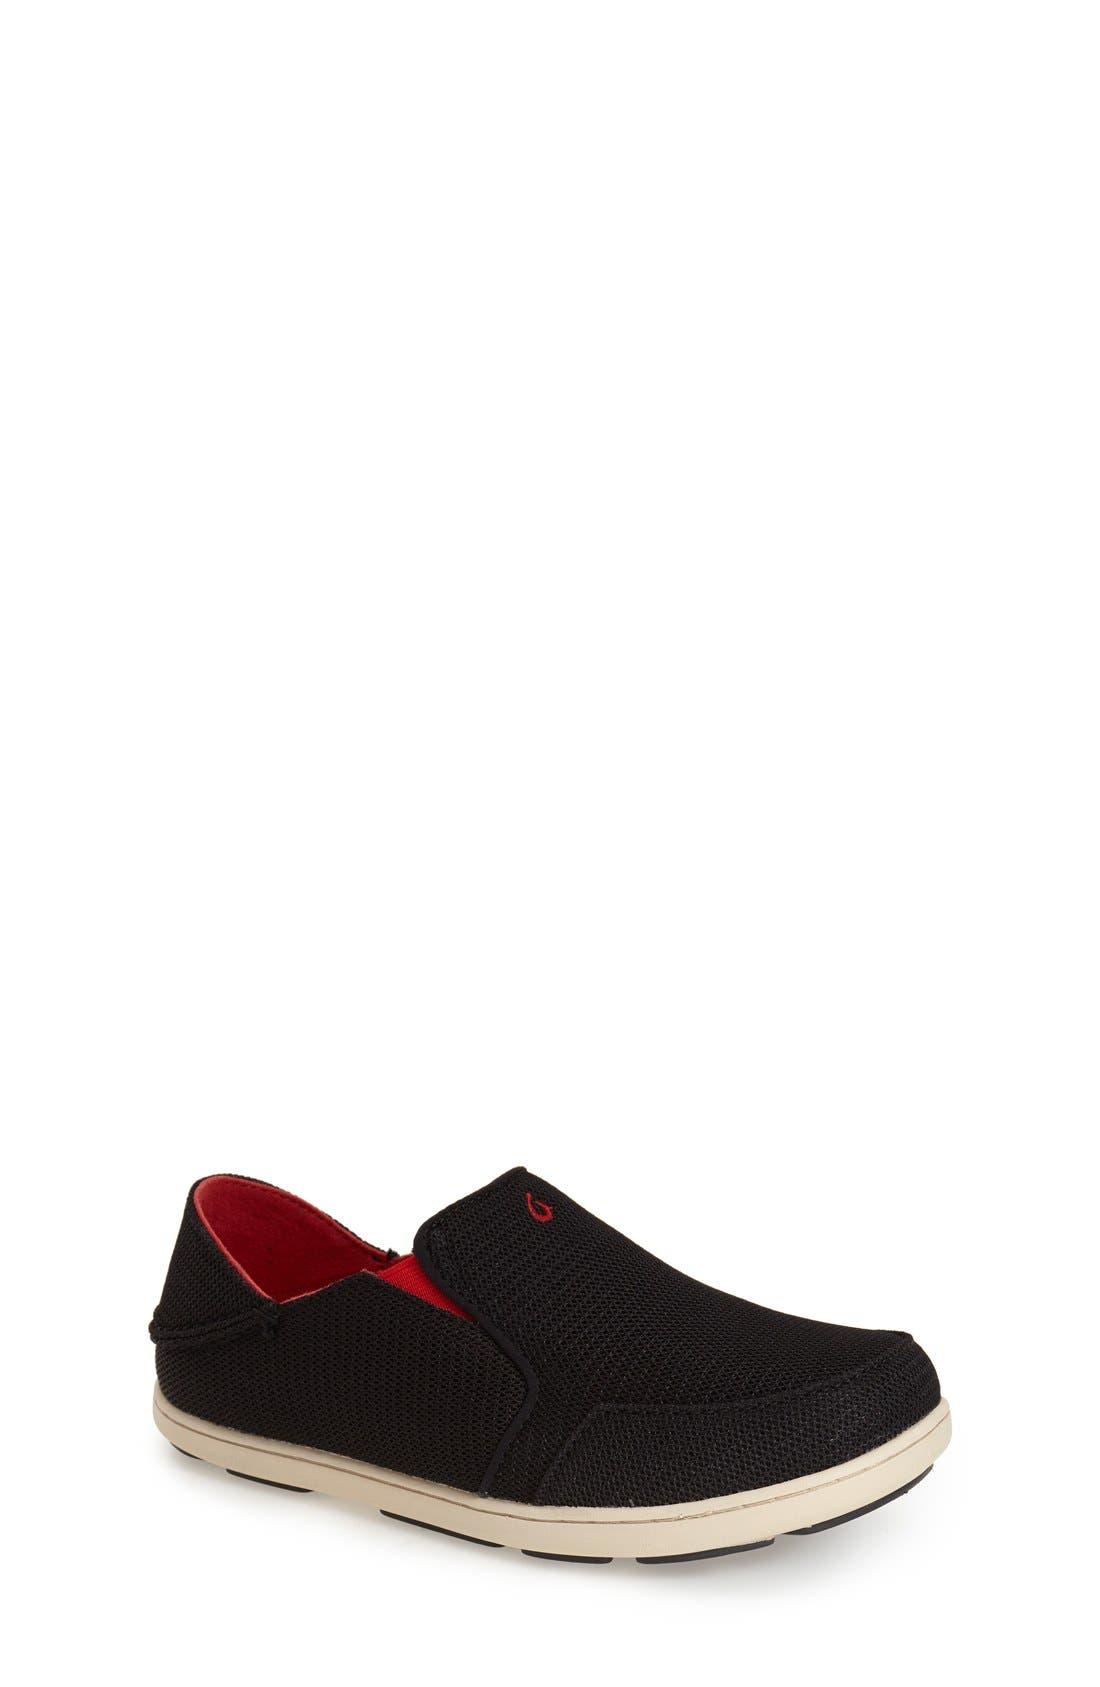 'Nohea' Mesh Shoe, Main, color, 005